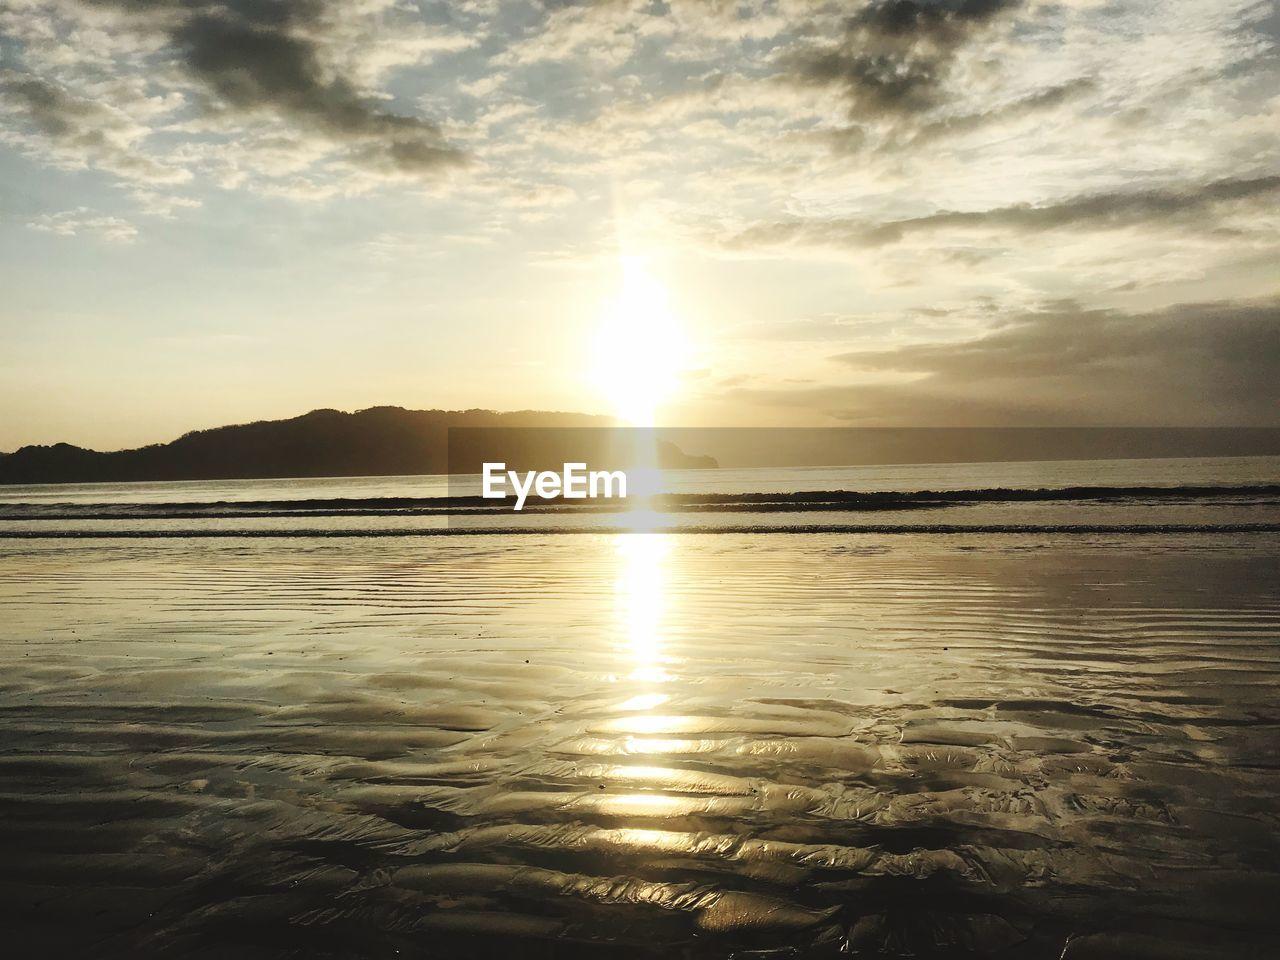 sky, beauty in nature, cloud - sky, water, sunset, scenics - nature, tranquility, tranquil scene, sea, reflection, sun, nature, sunlight, idyllic, no people, beach, land, horizon over water, non-urban scene, outdoors